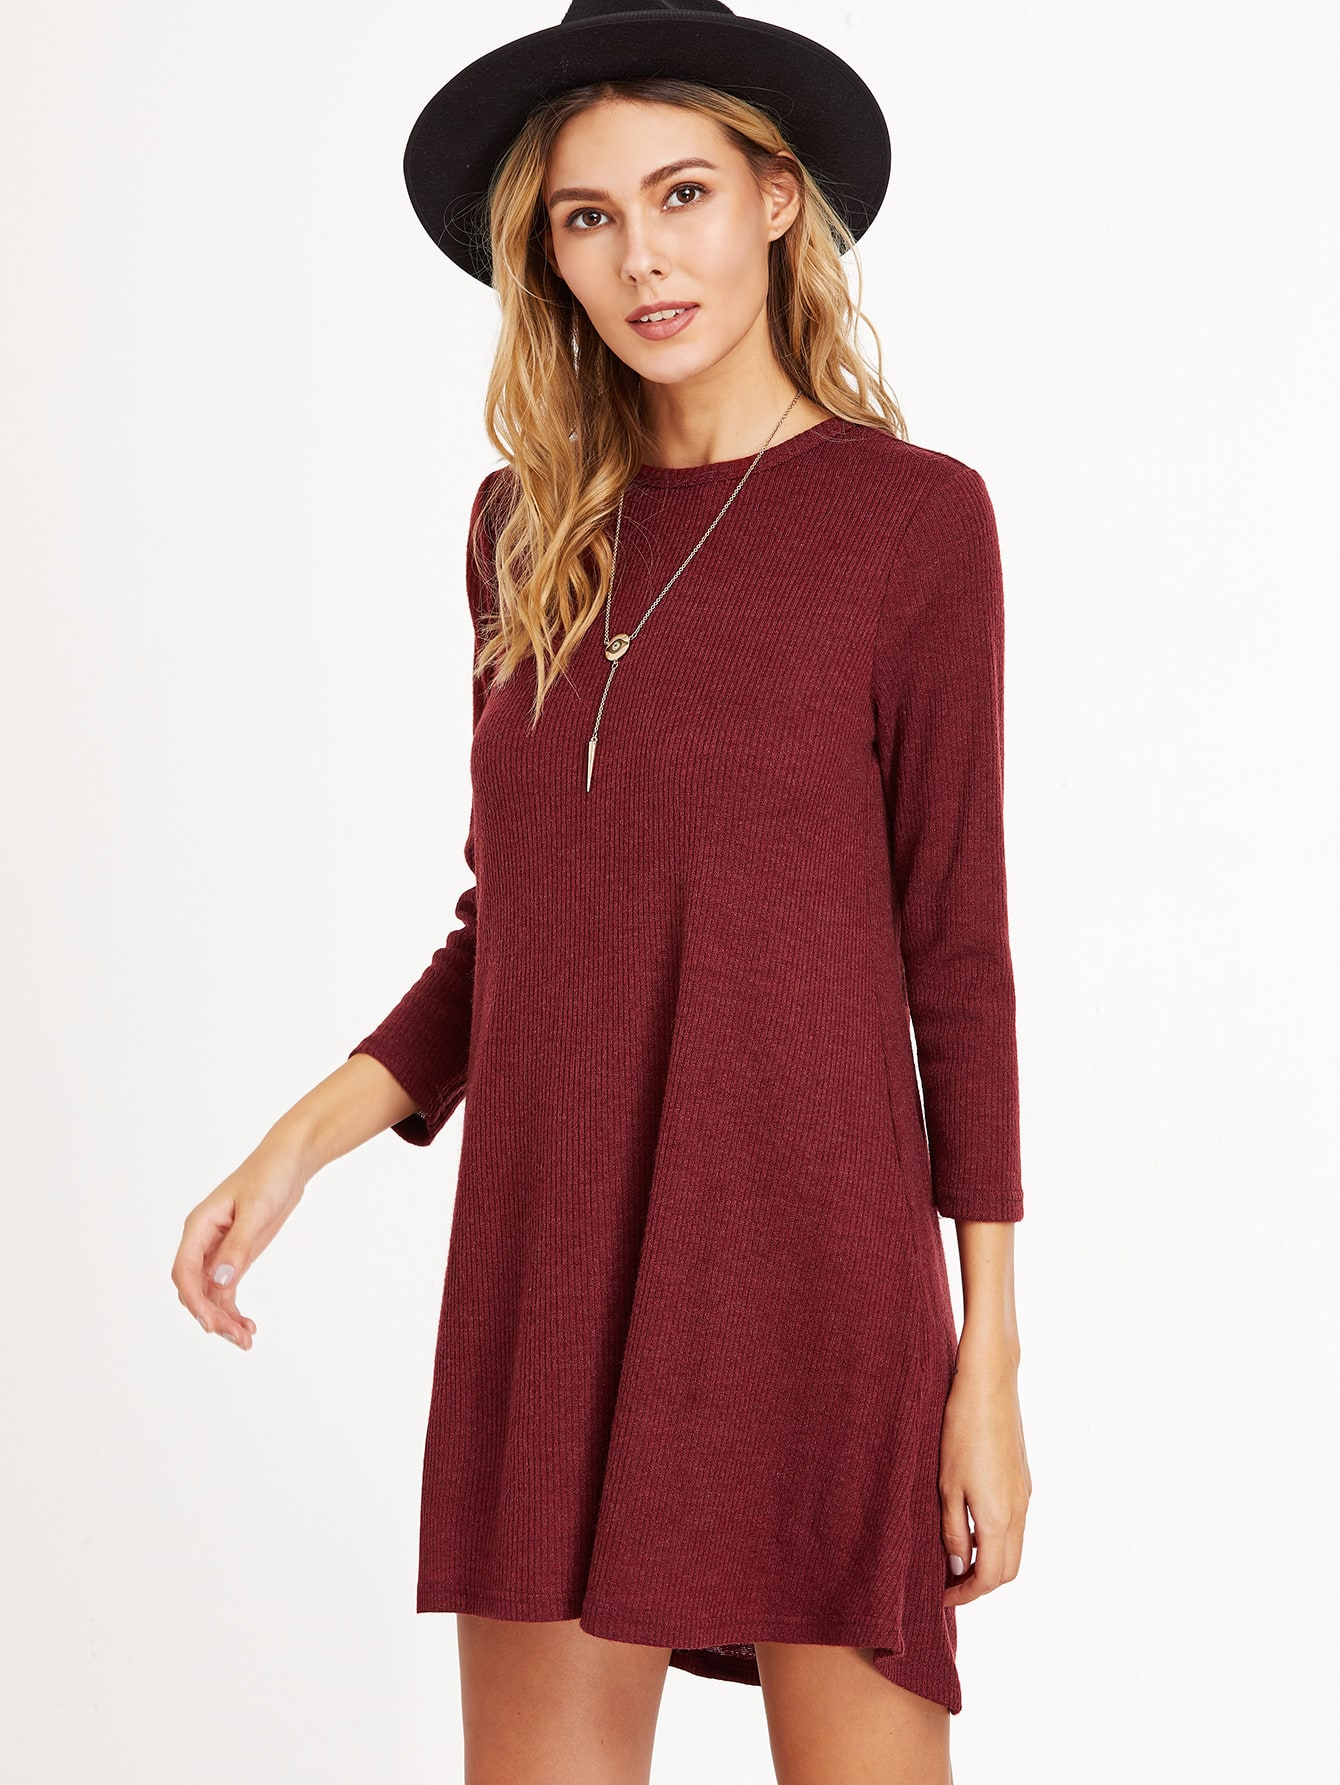 Burgundy Ribbed Knit A Line Dress dress161111718